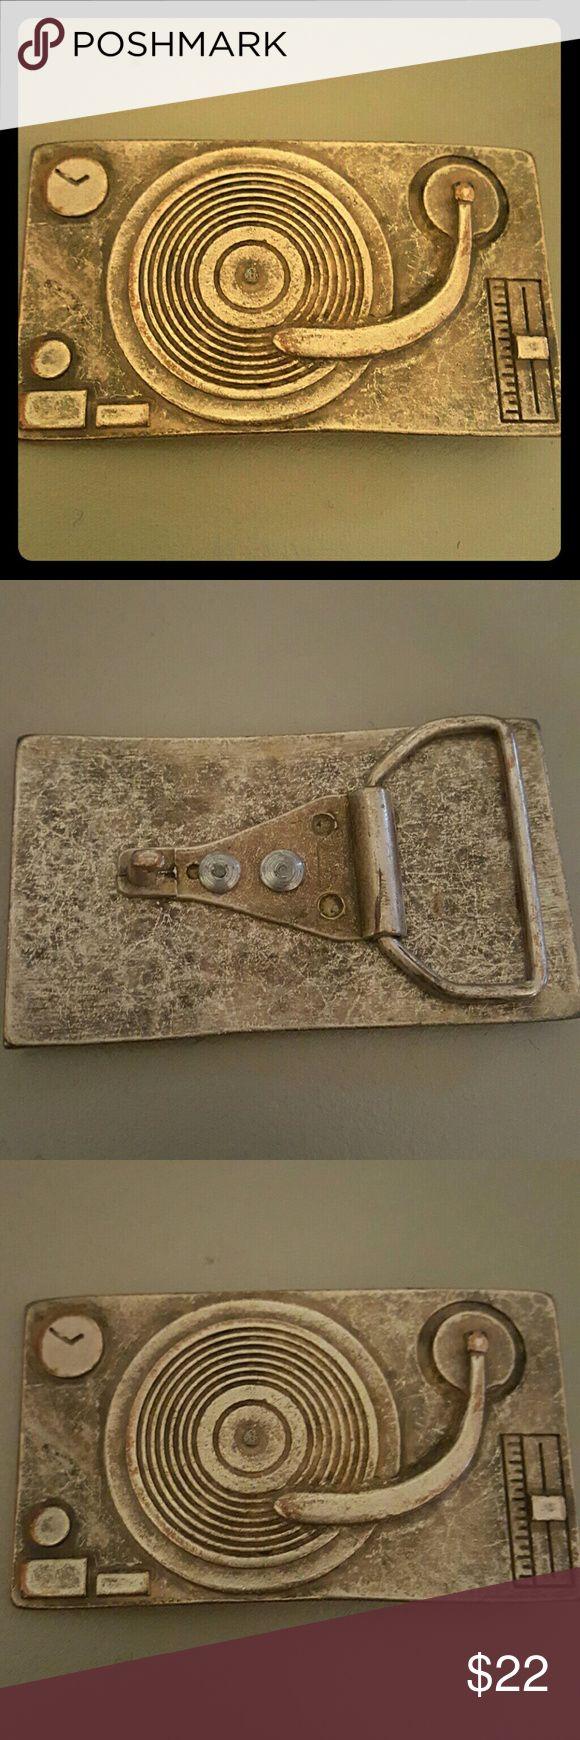 Metal Turntable Belt Buckle Metal turntable belt buckle. Accessories Belts